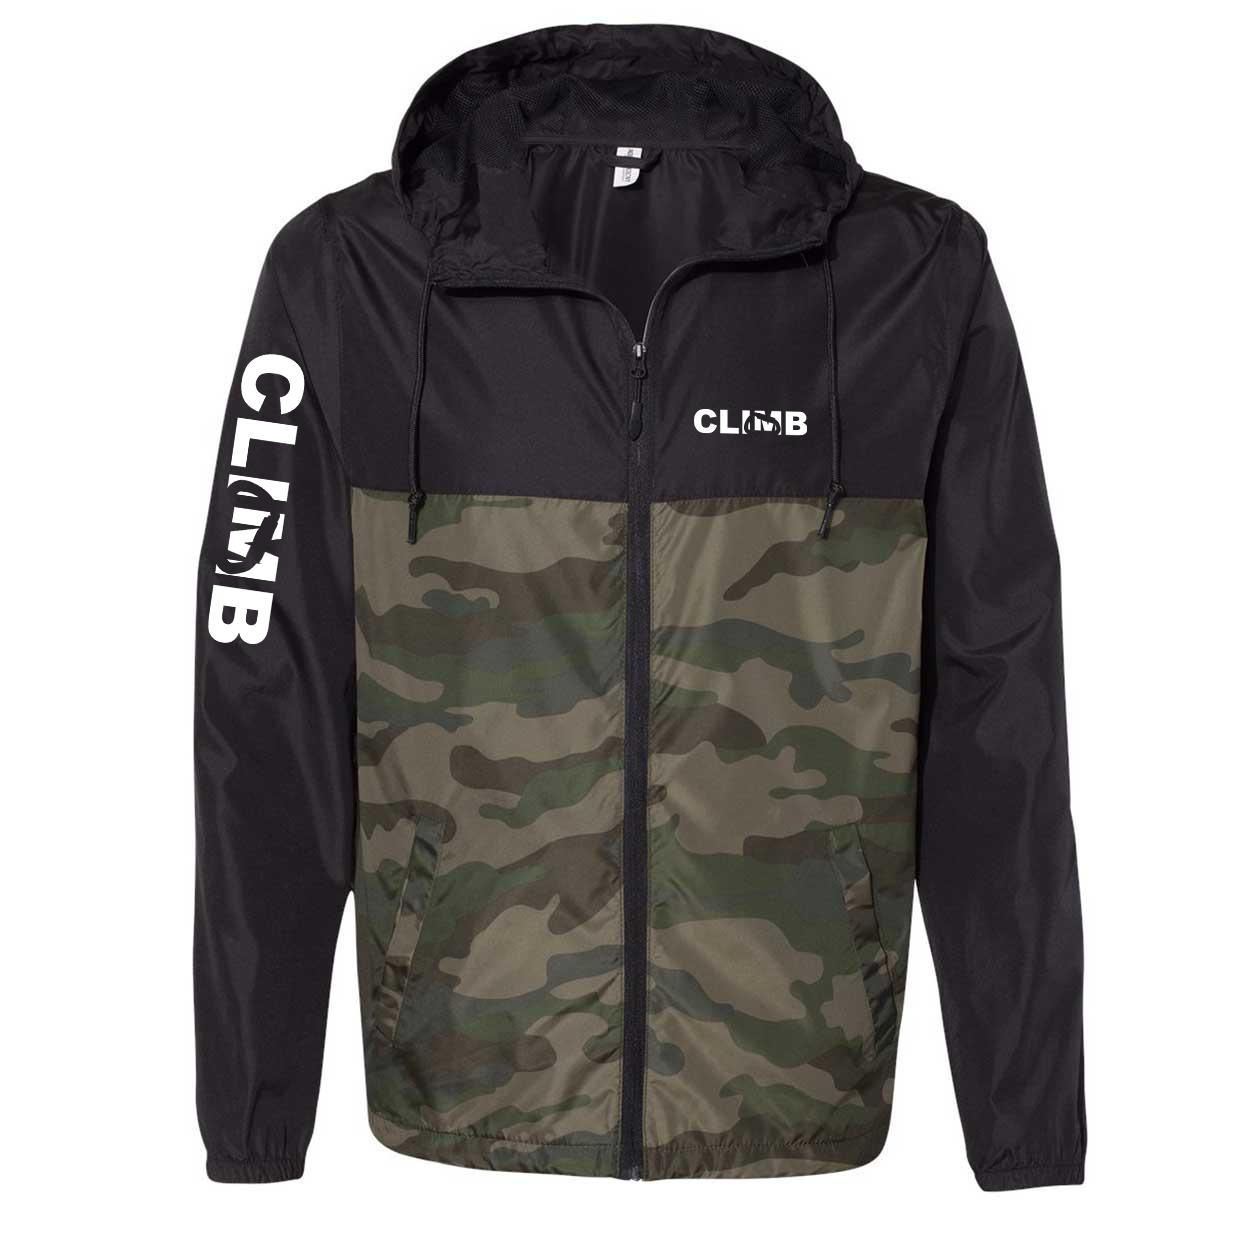 Climb Carabiner Logo Classic Lightweight Windbreaker Black/Forest Camo (White Logo)